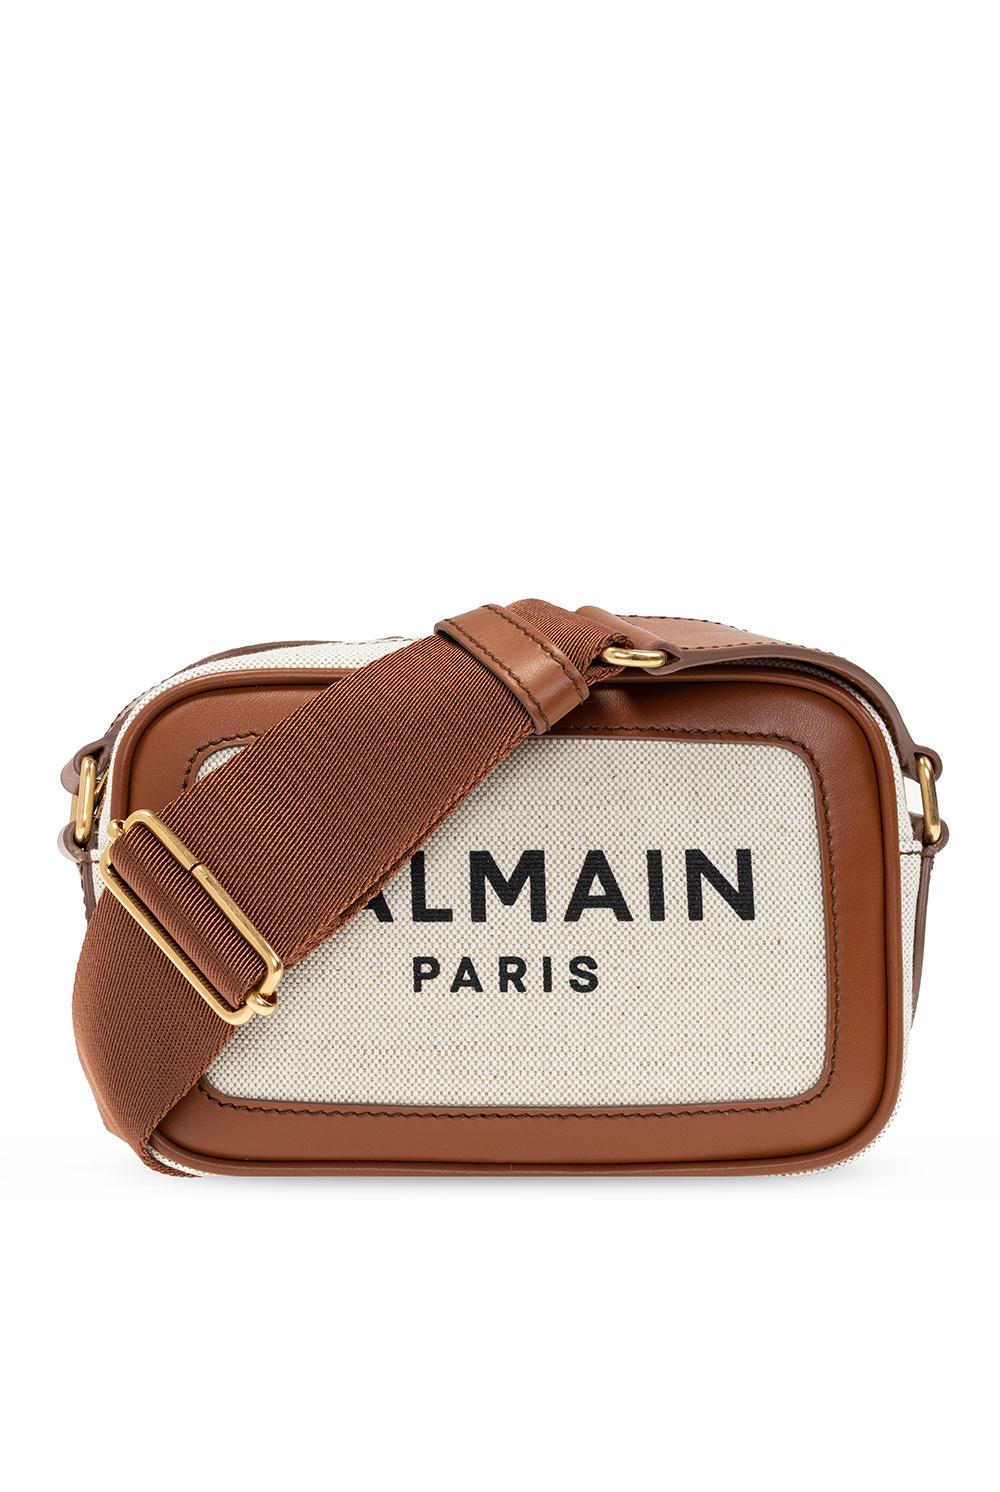 Balmain Shoulder bag with logo